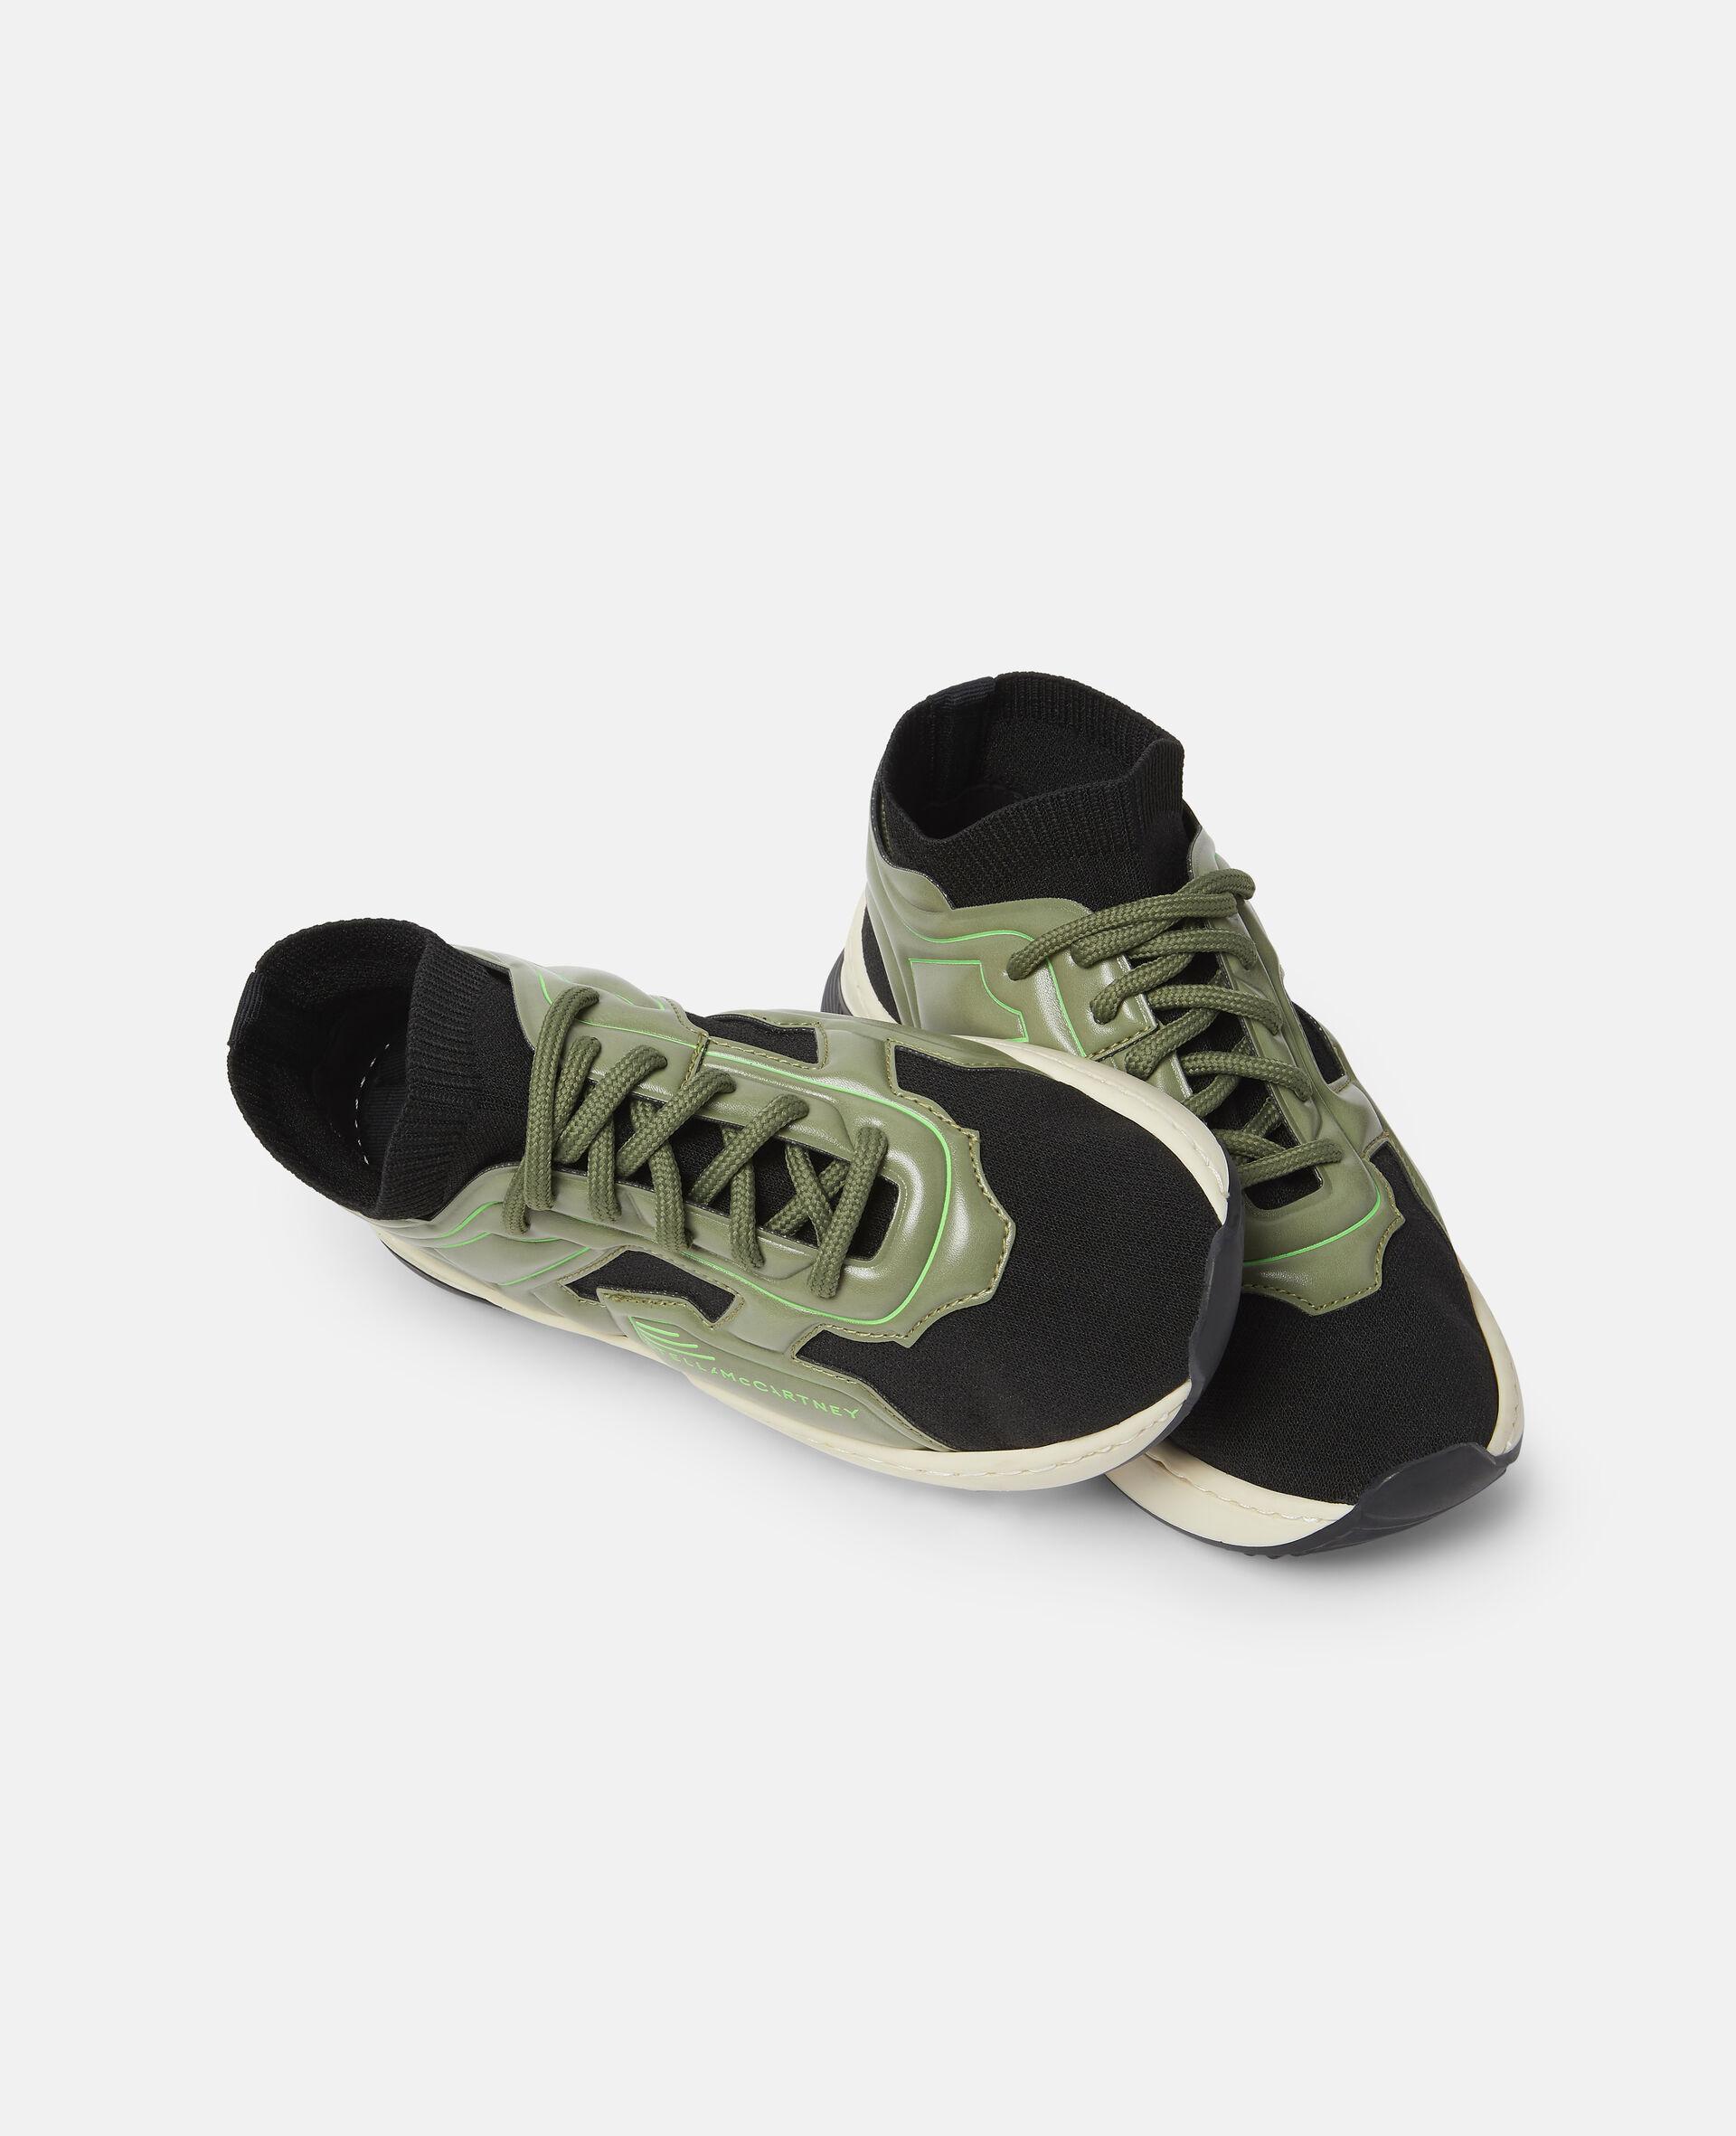 Knit Sock Sport Trainers-Black-large image number 1